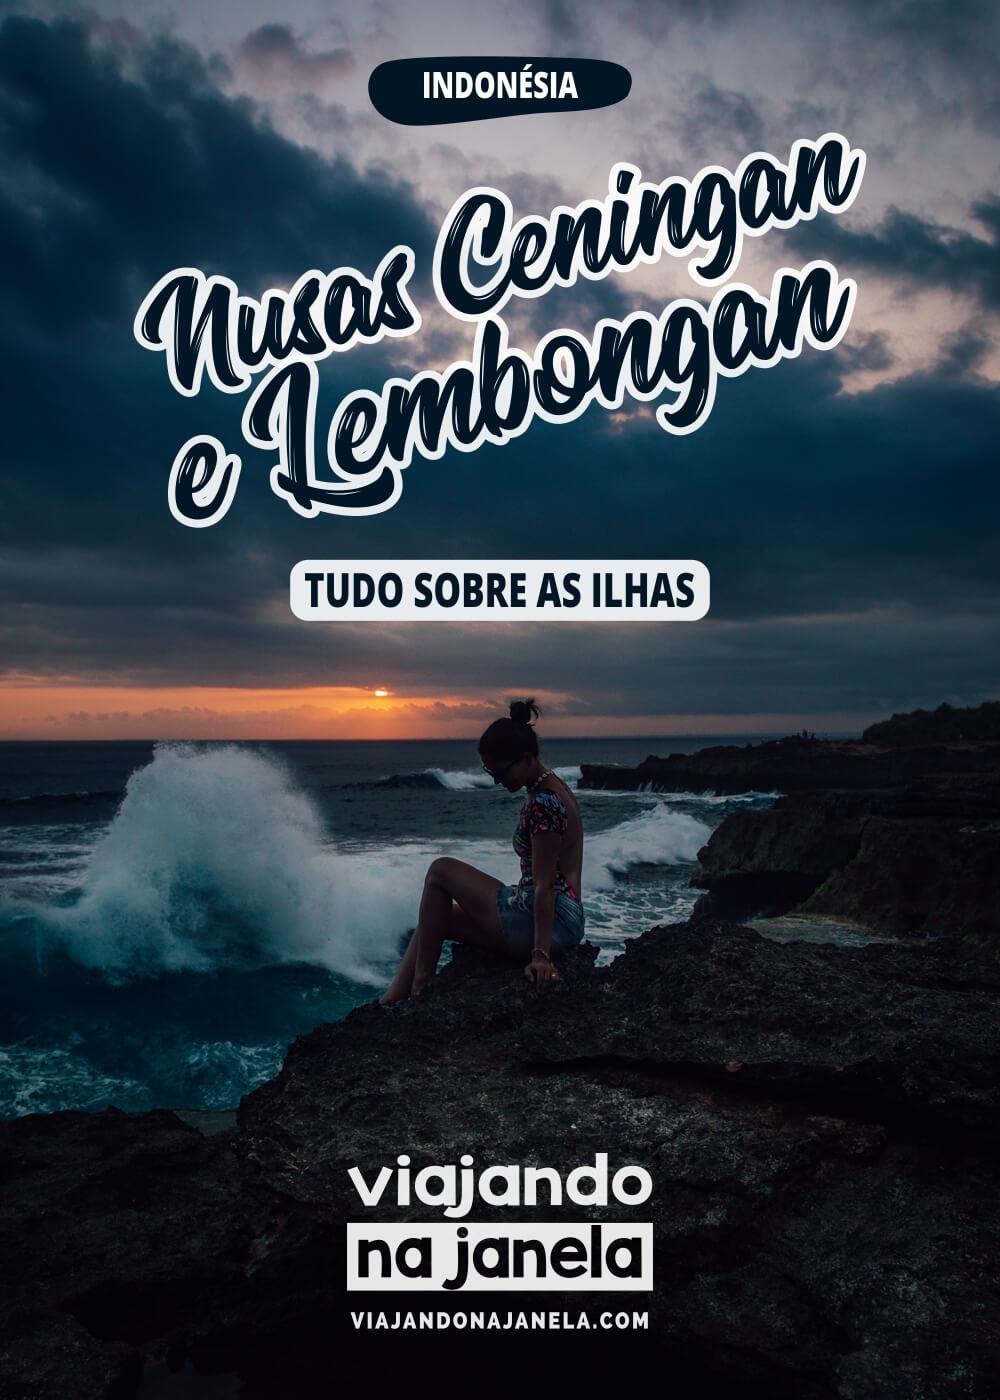 Nusa Ceningan e Nusa Lembongan